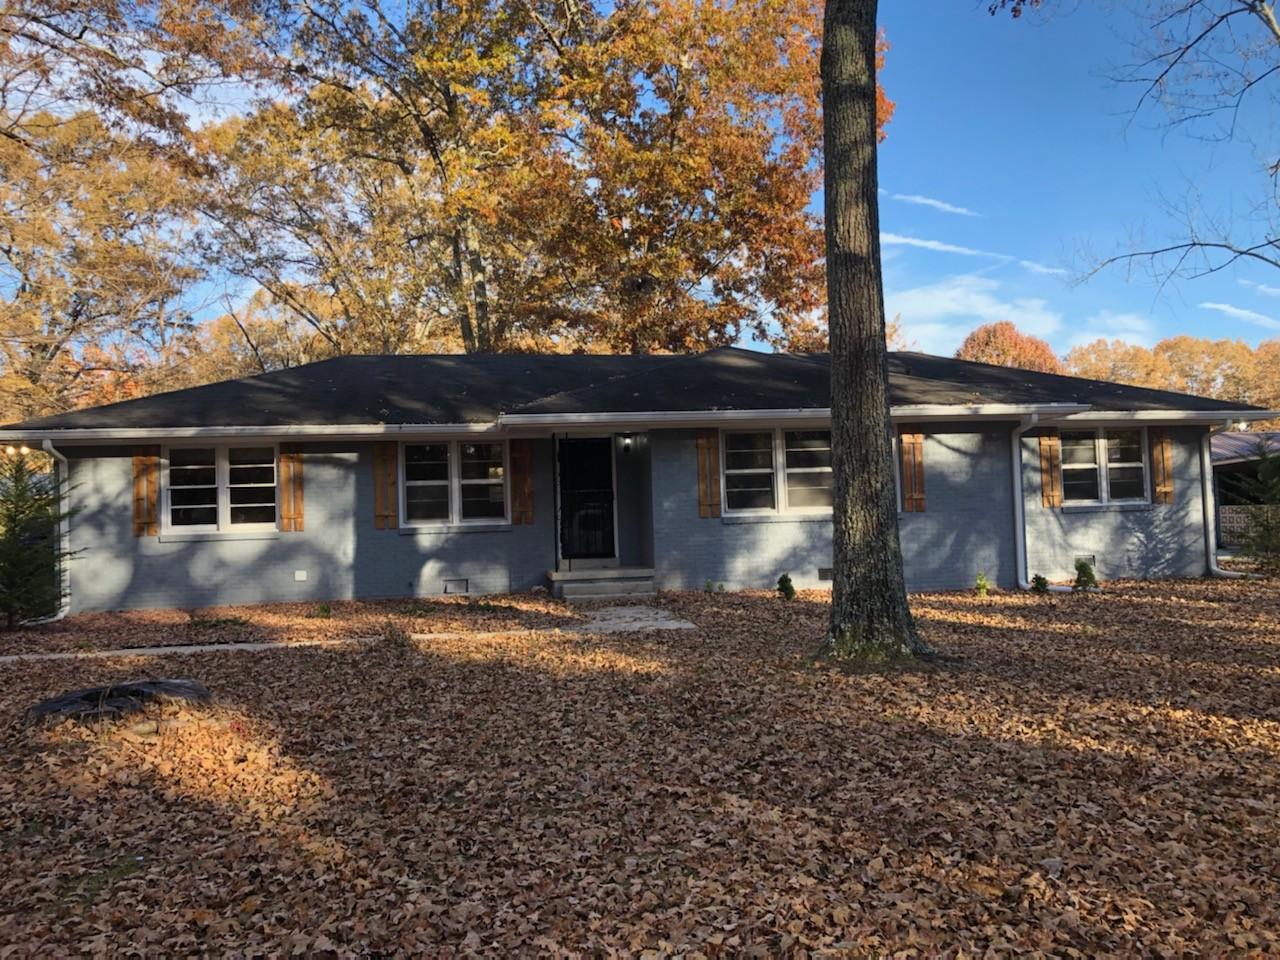 1007 Westwood Dr, Tullahoma, TN 37388 - Tullahoma, TN real estate listing